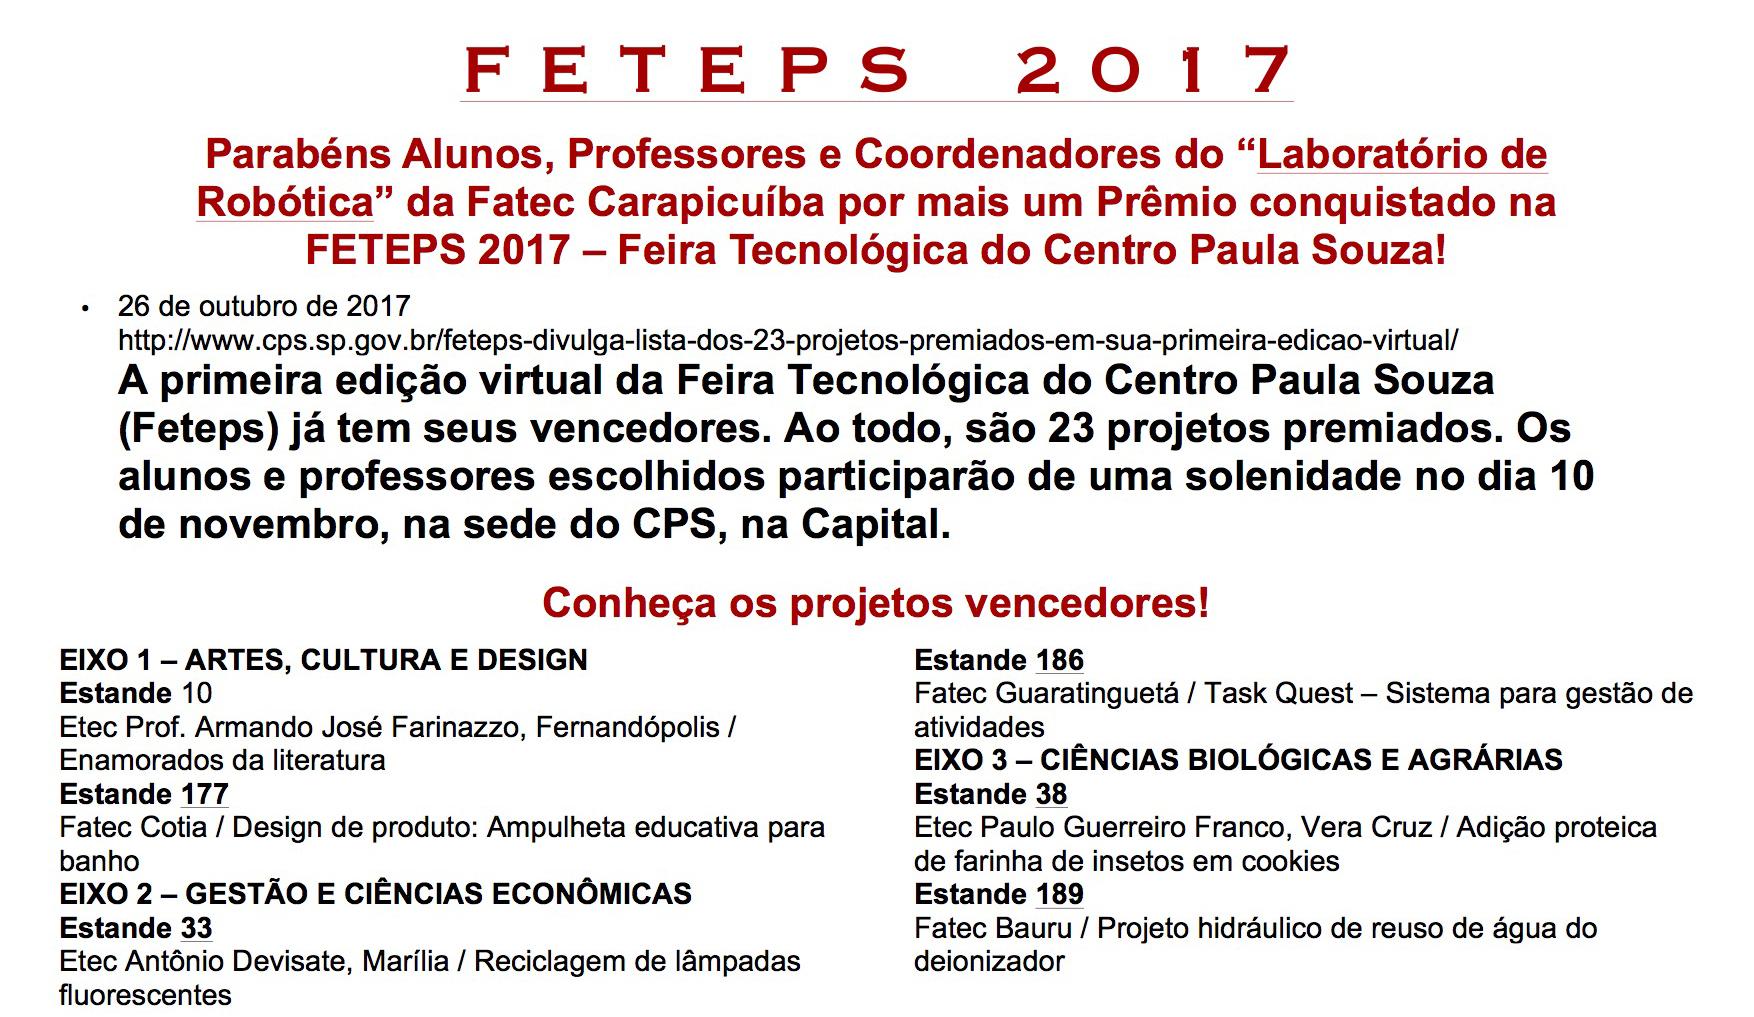 PREMIO FETEPS 2017_FATEC CARAPICUIBA1